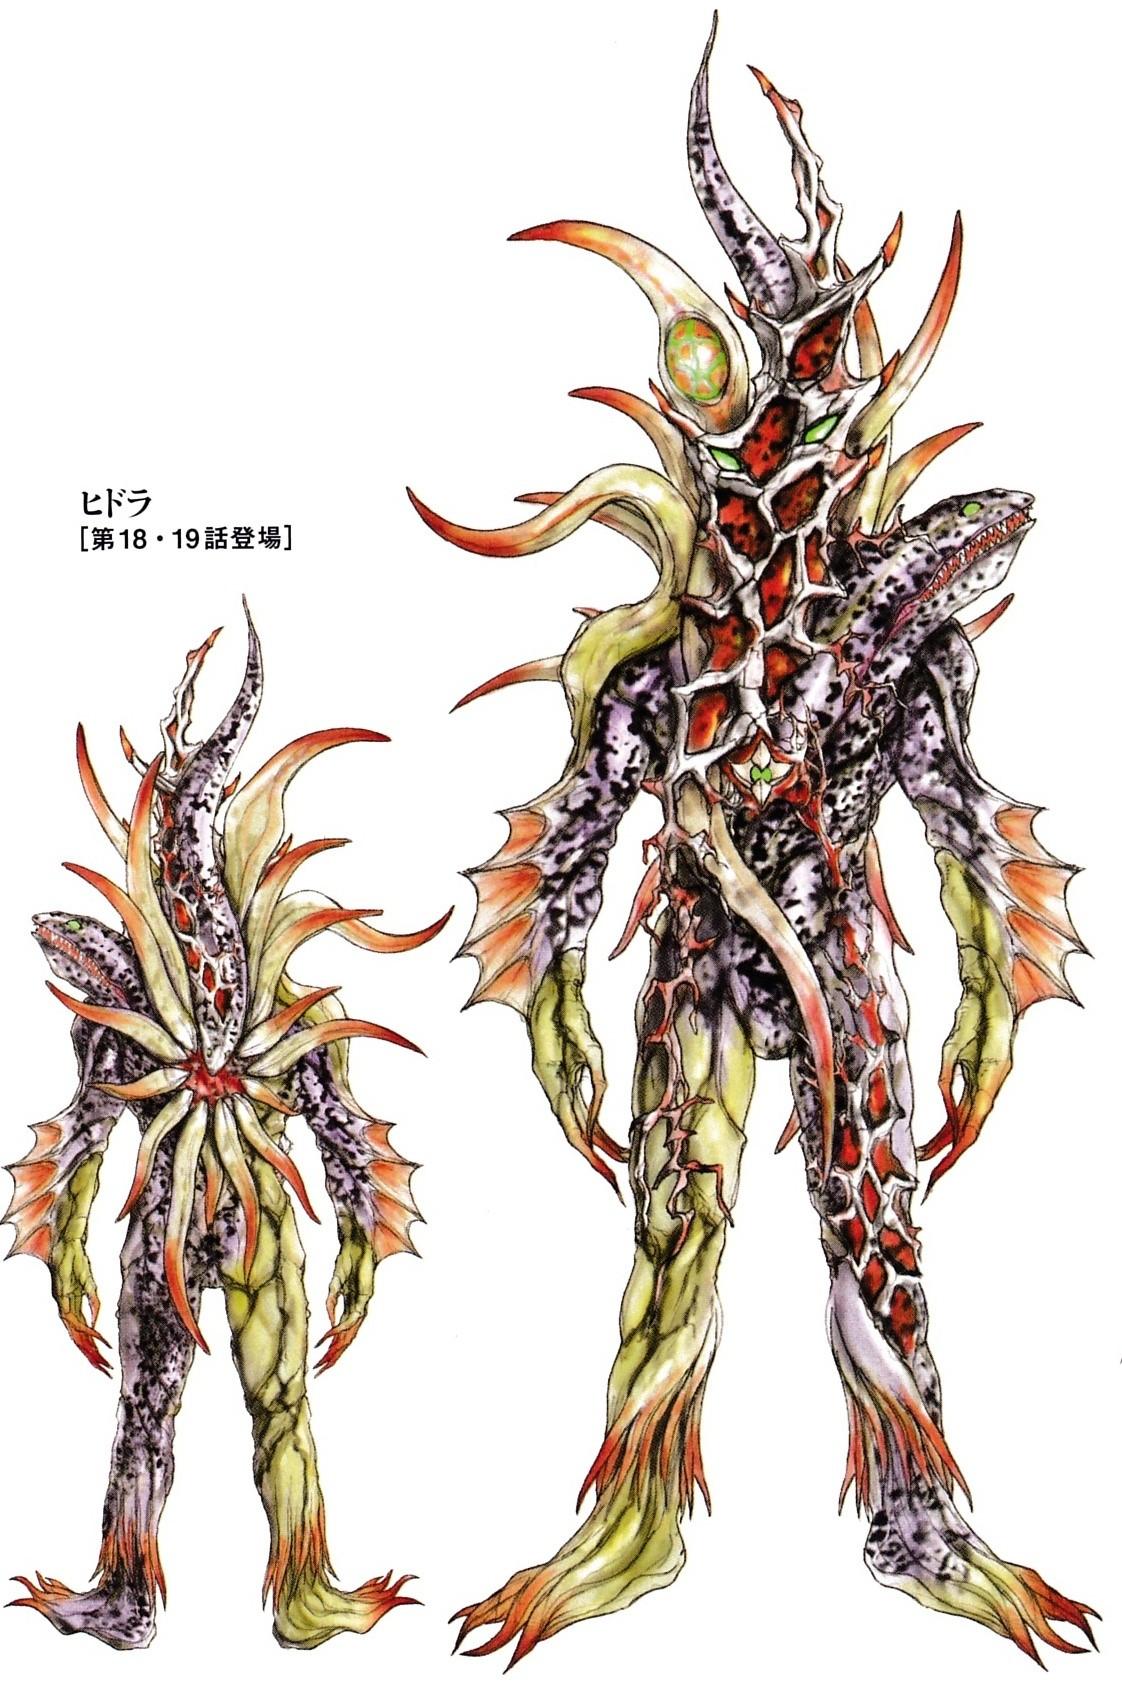 Hydra concept art